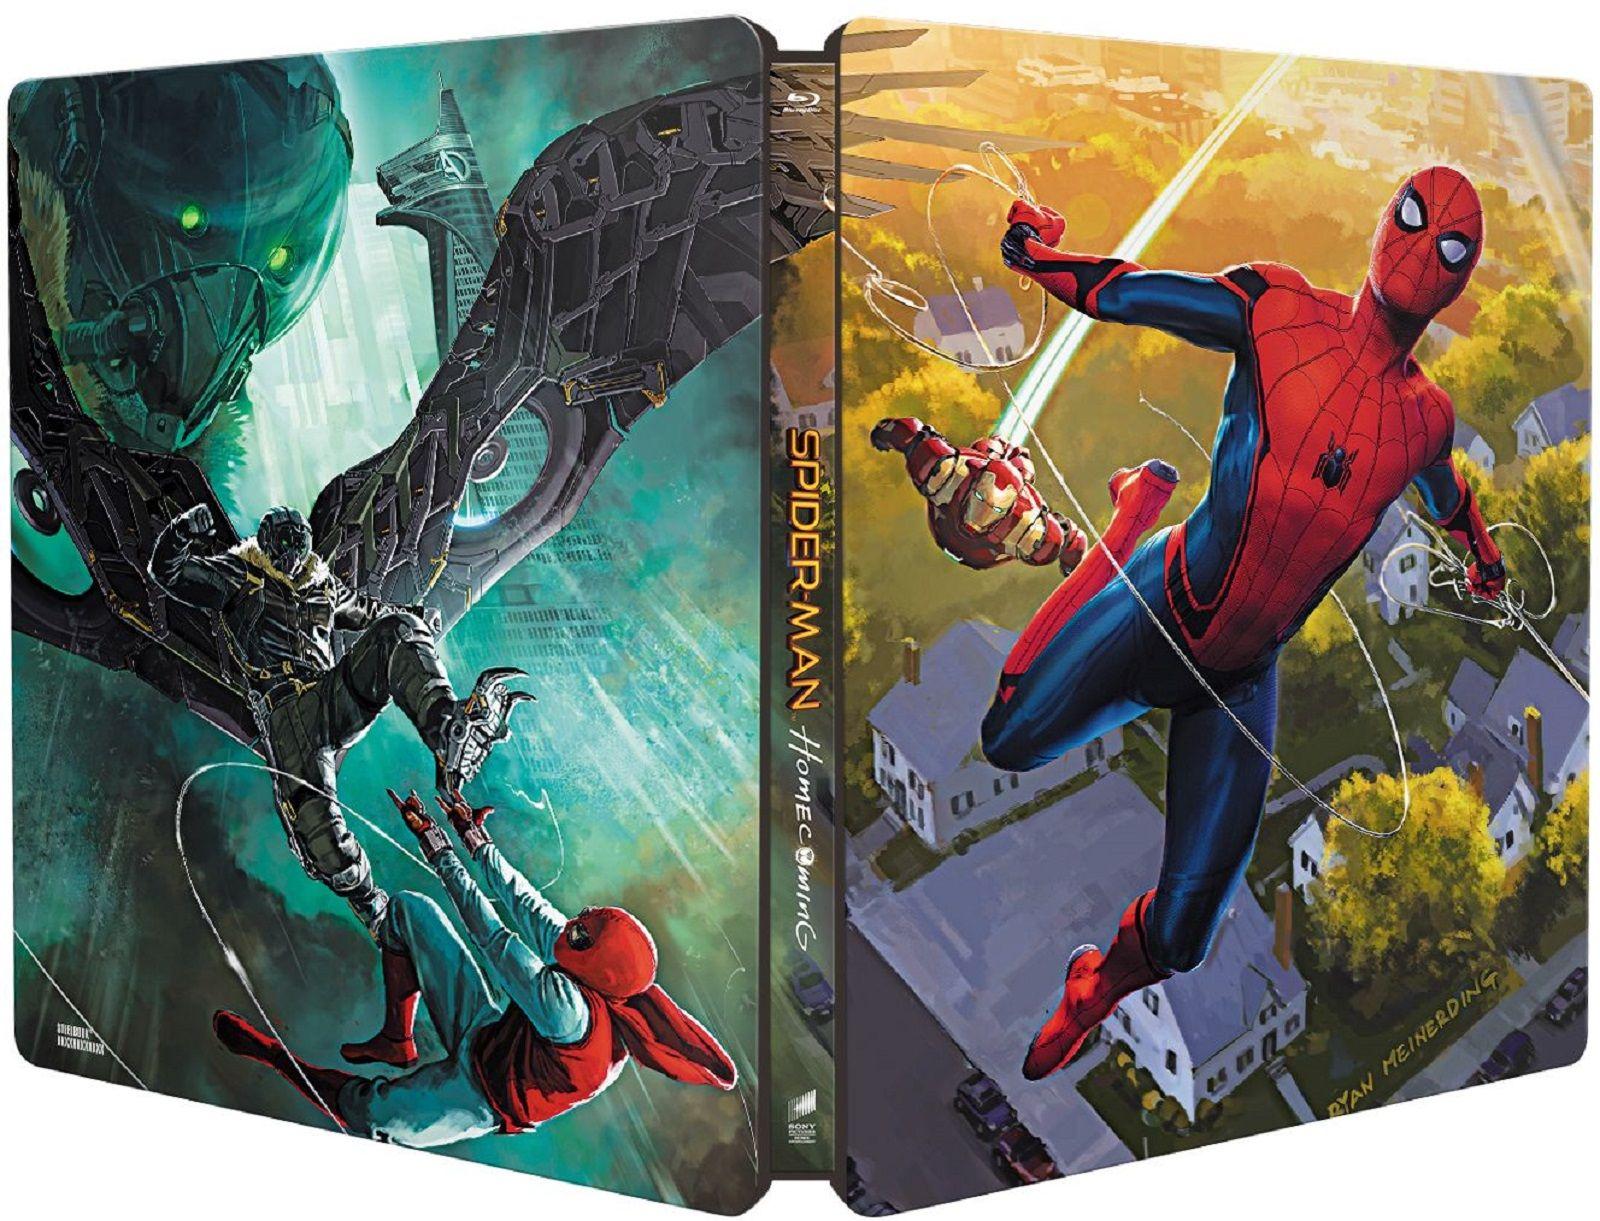 Спайдър-мен: Завръщане у дома Steelbook Edition 3D+2D (Blu-Ray) - 3